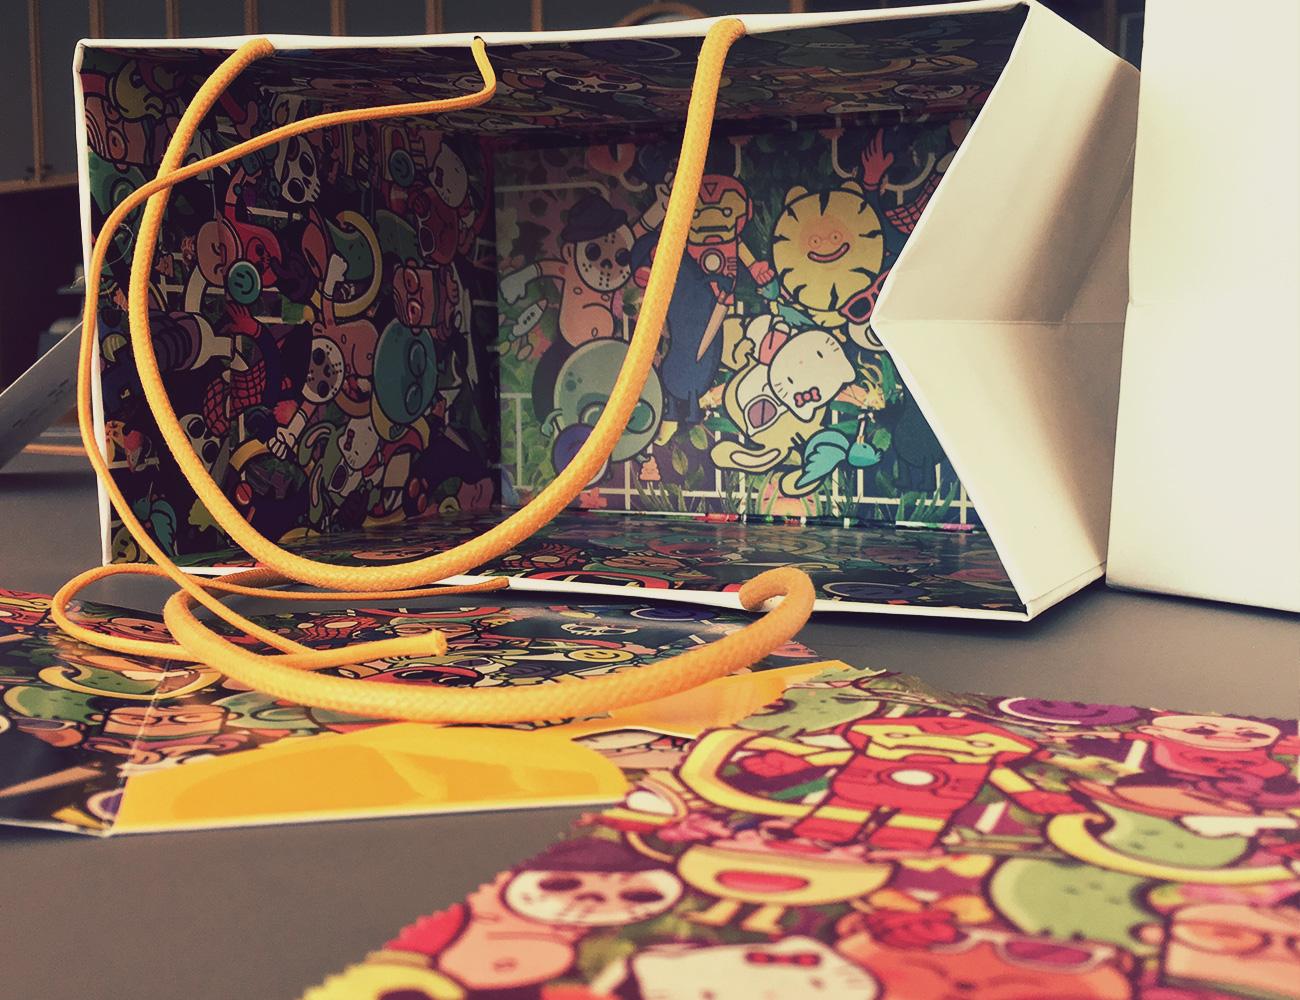 shopping-bag-packaging-grafica-logo-gli-essenziali-cosmetica-digit81-simone-roveda